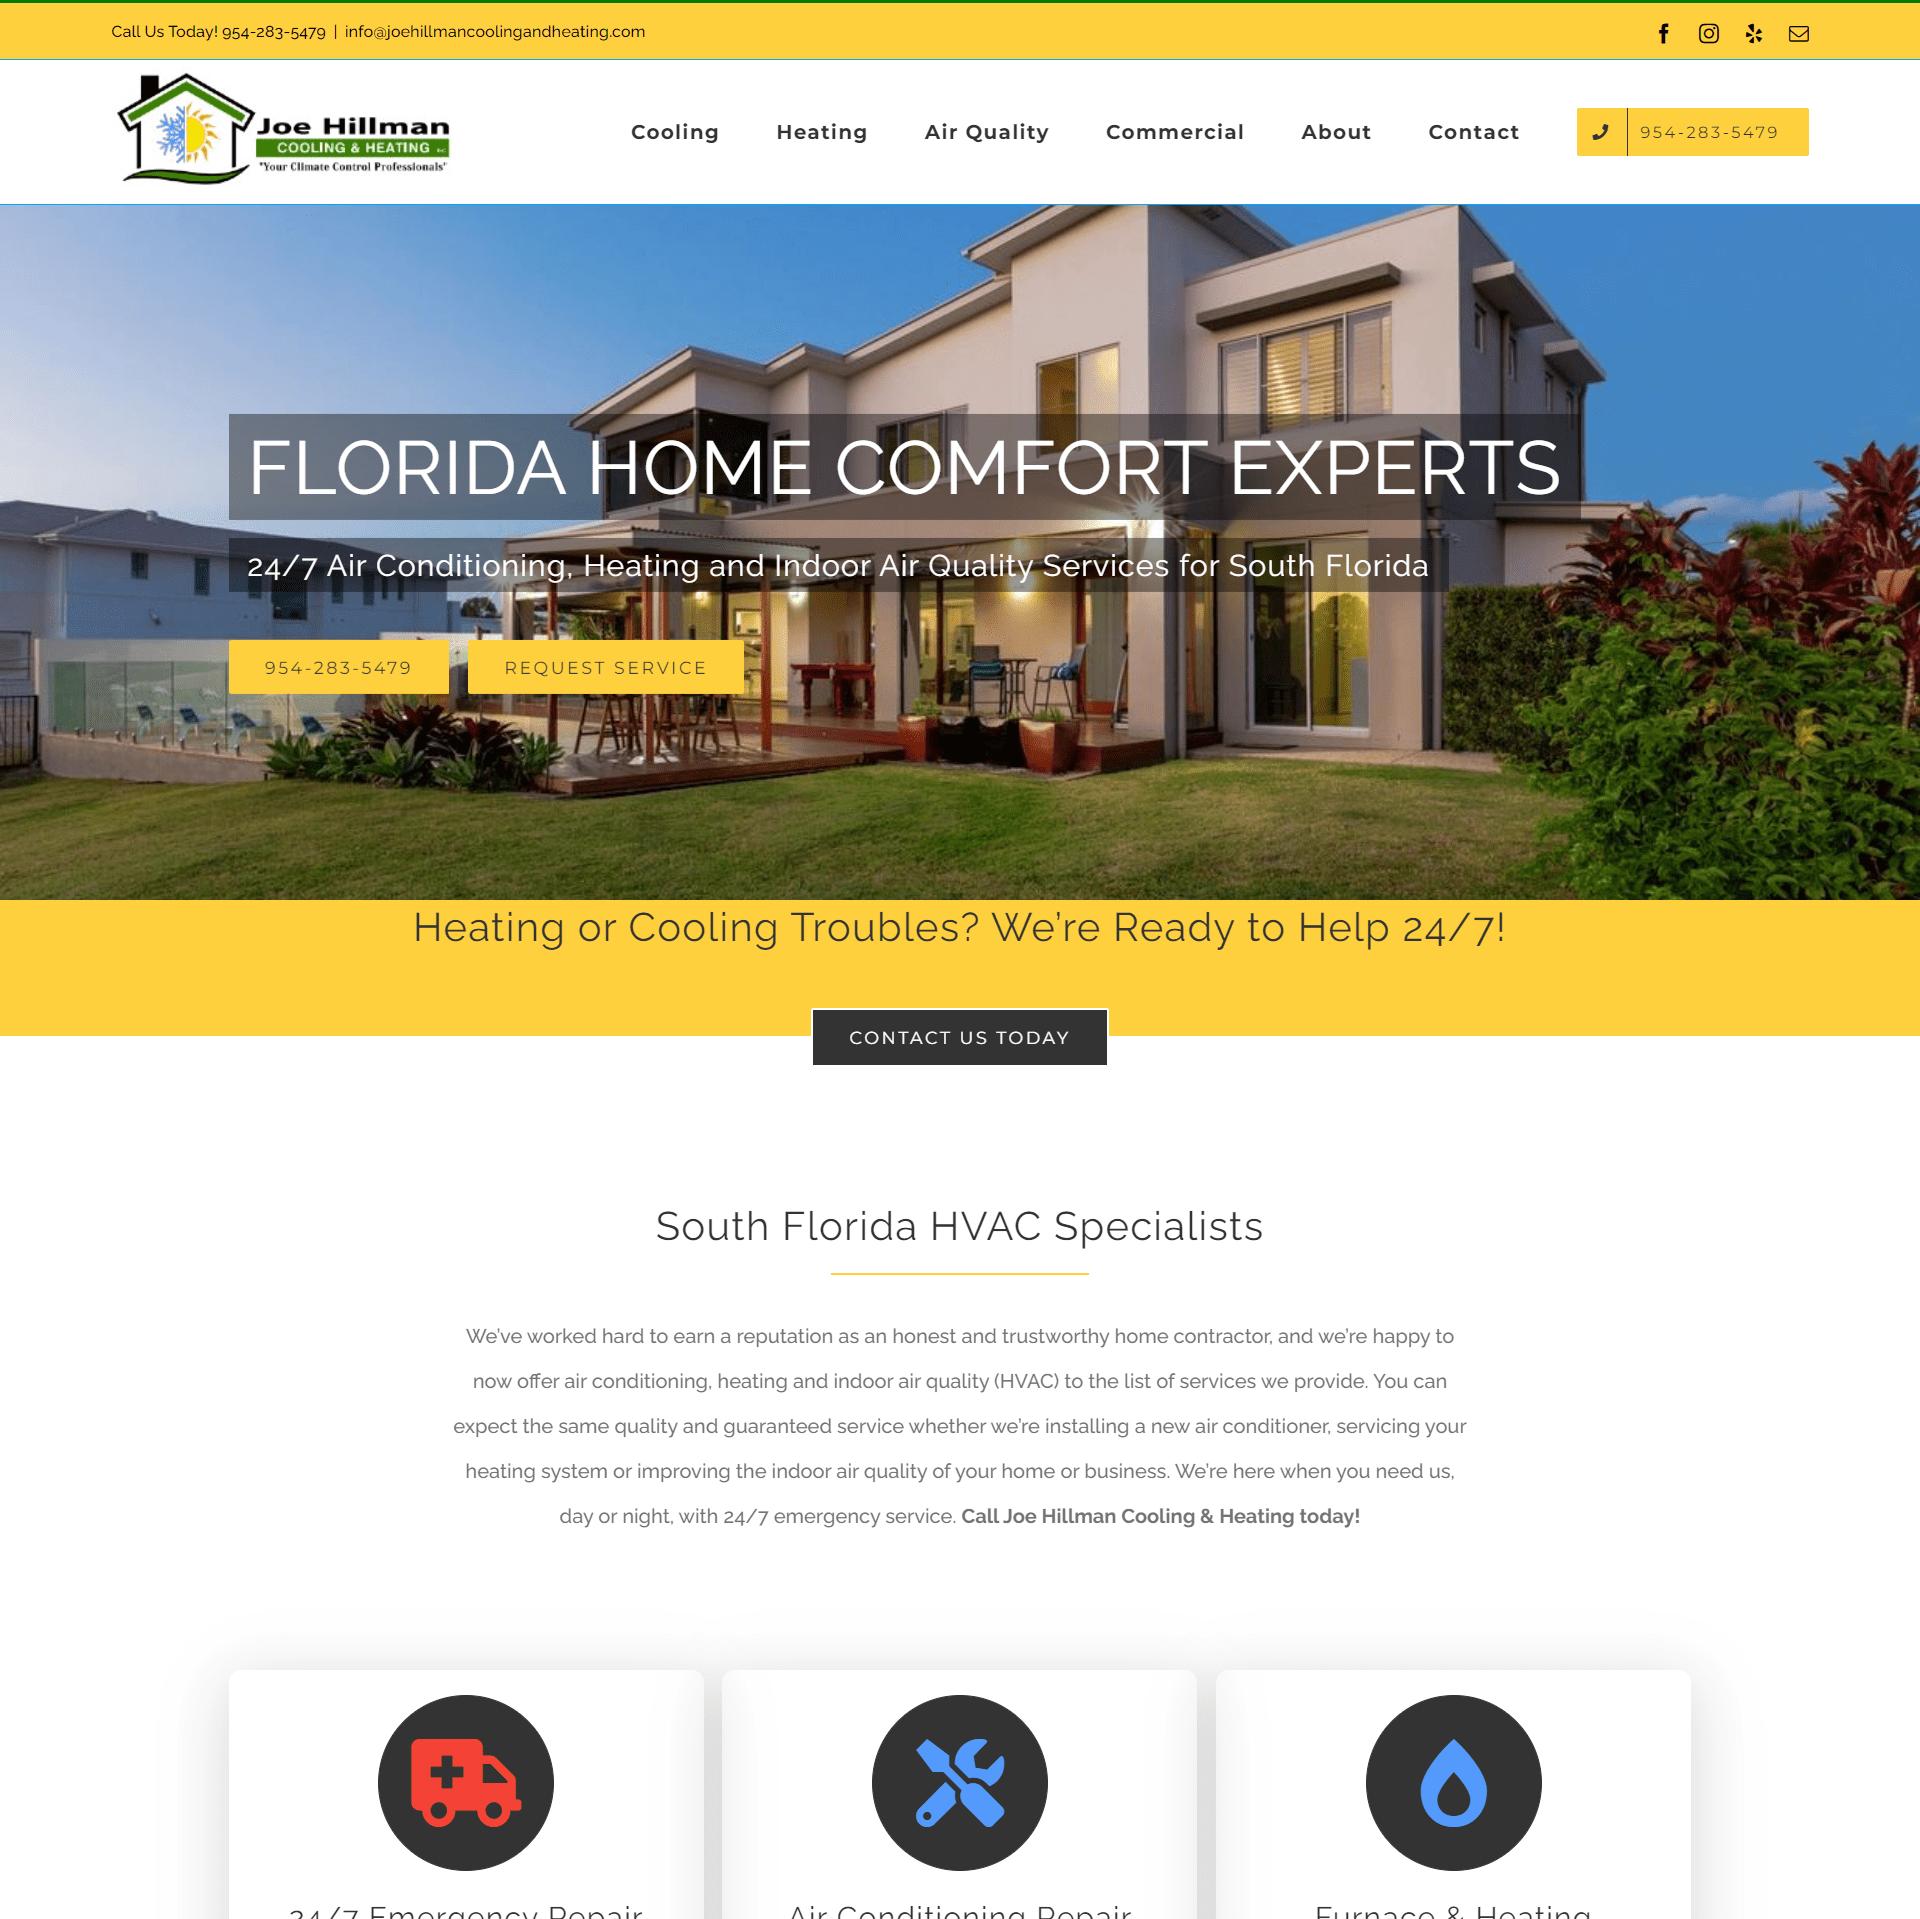 Joe Hillman HVAC Website